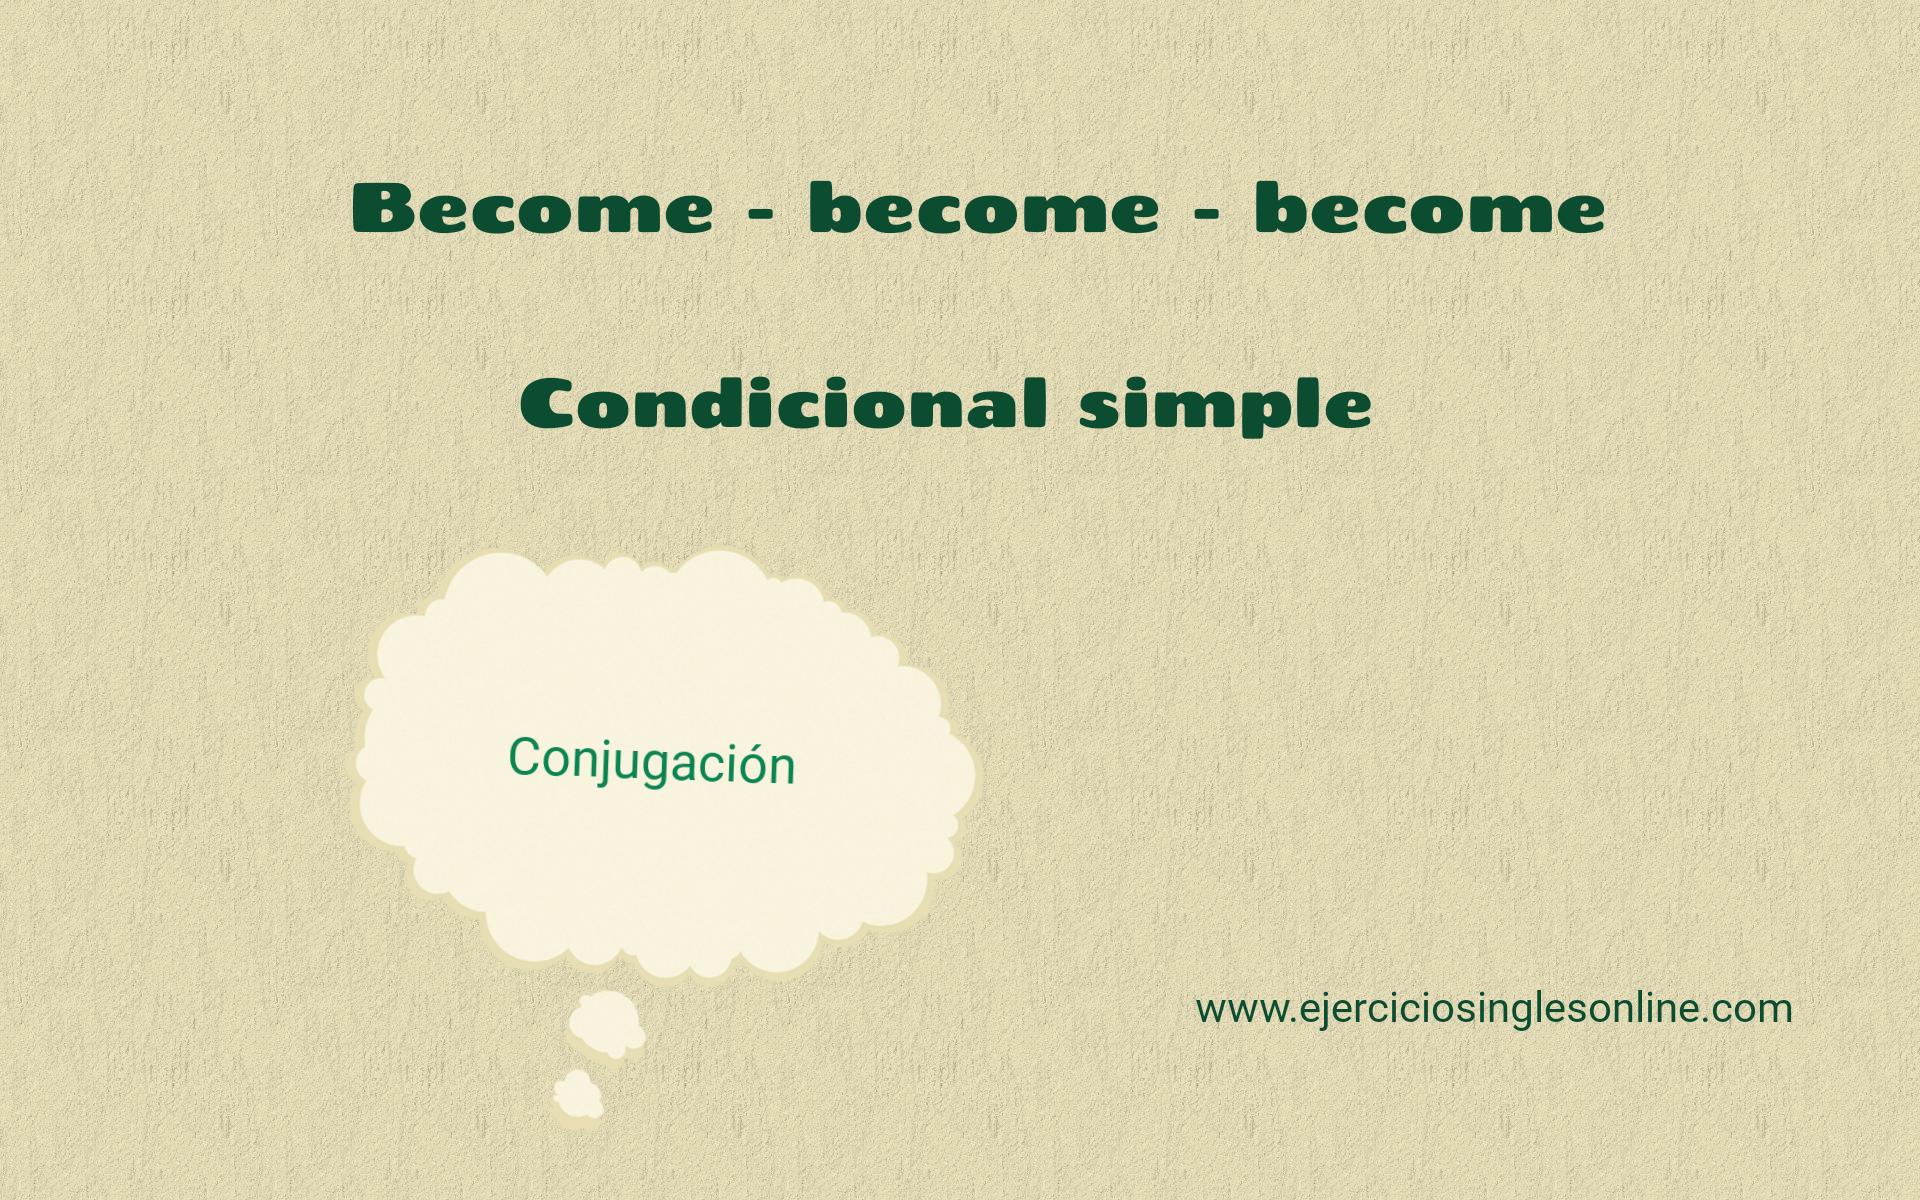 Become - Condicional Simple